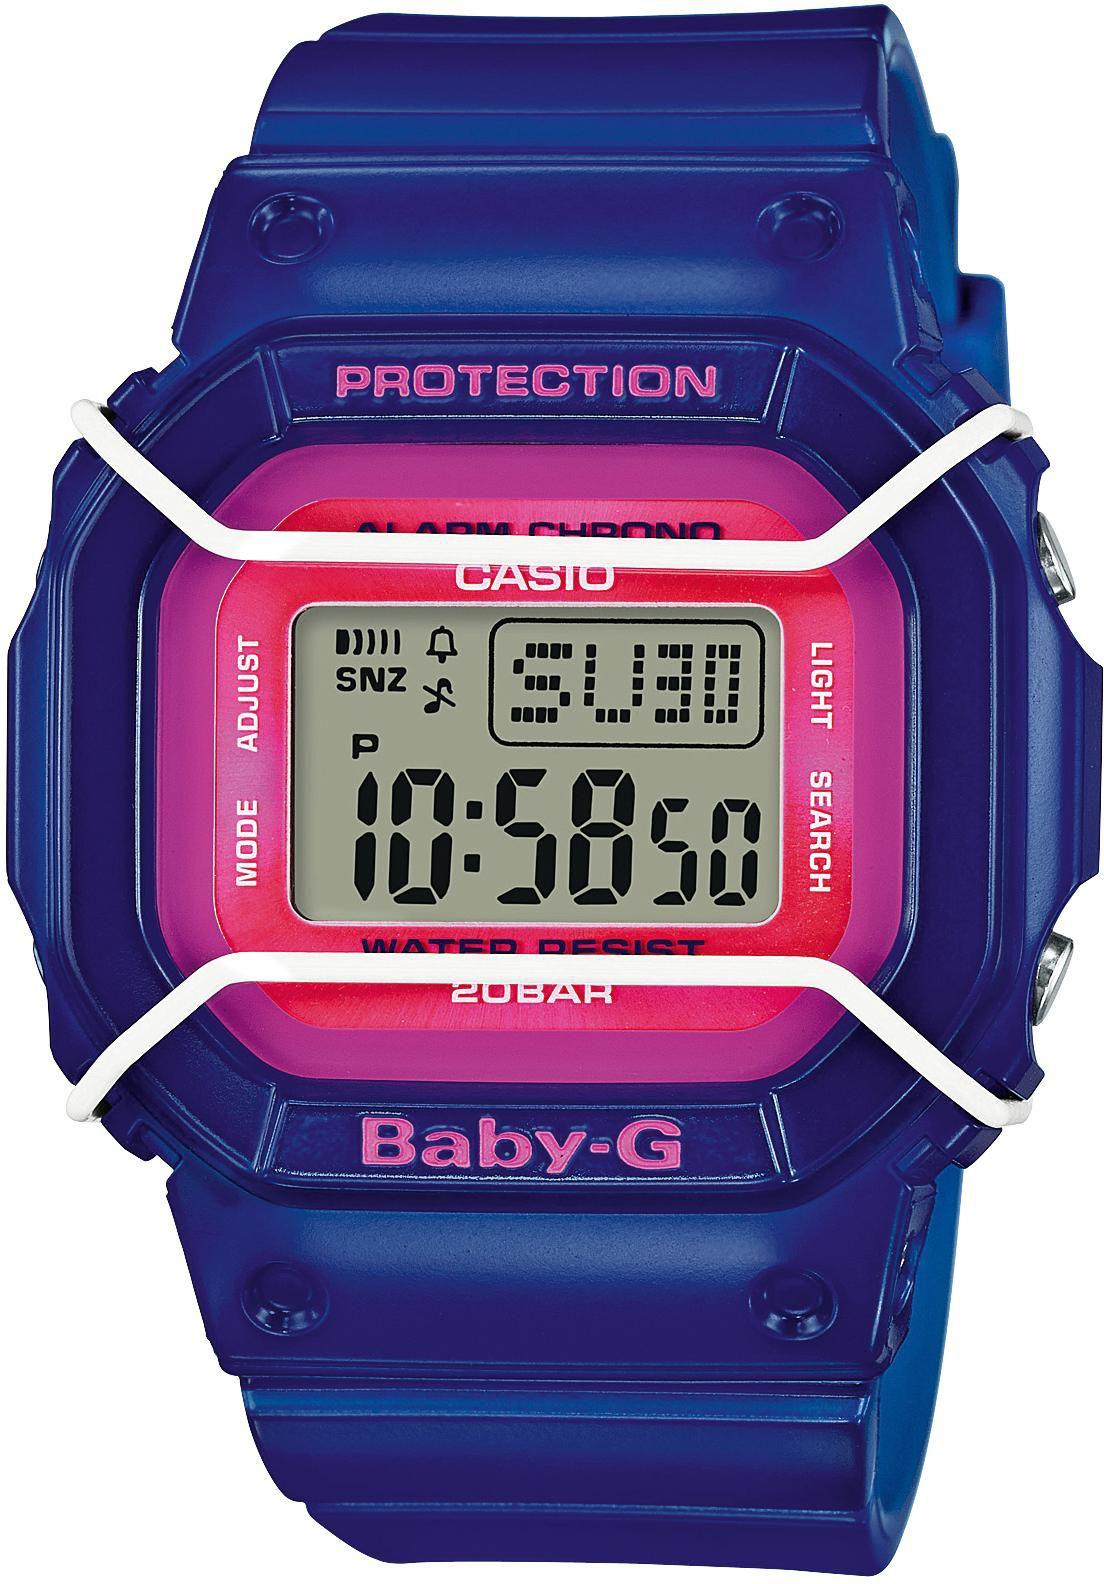 CASIO BABY G Baby-G Armbanduhr Blau Casio pink